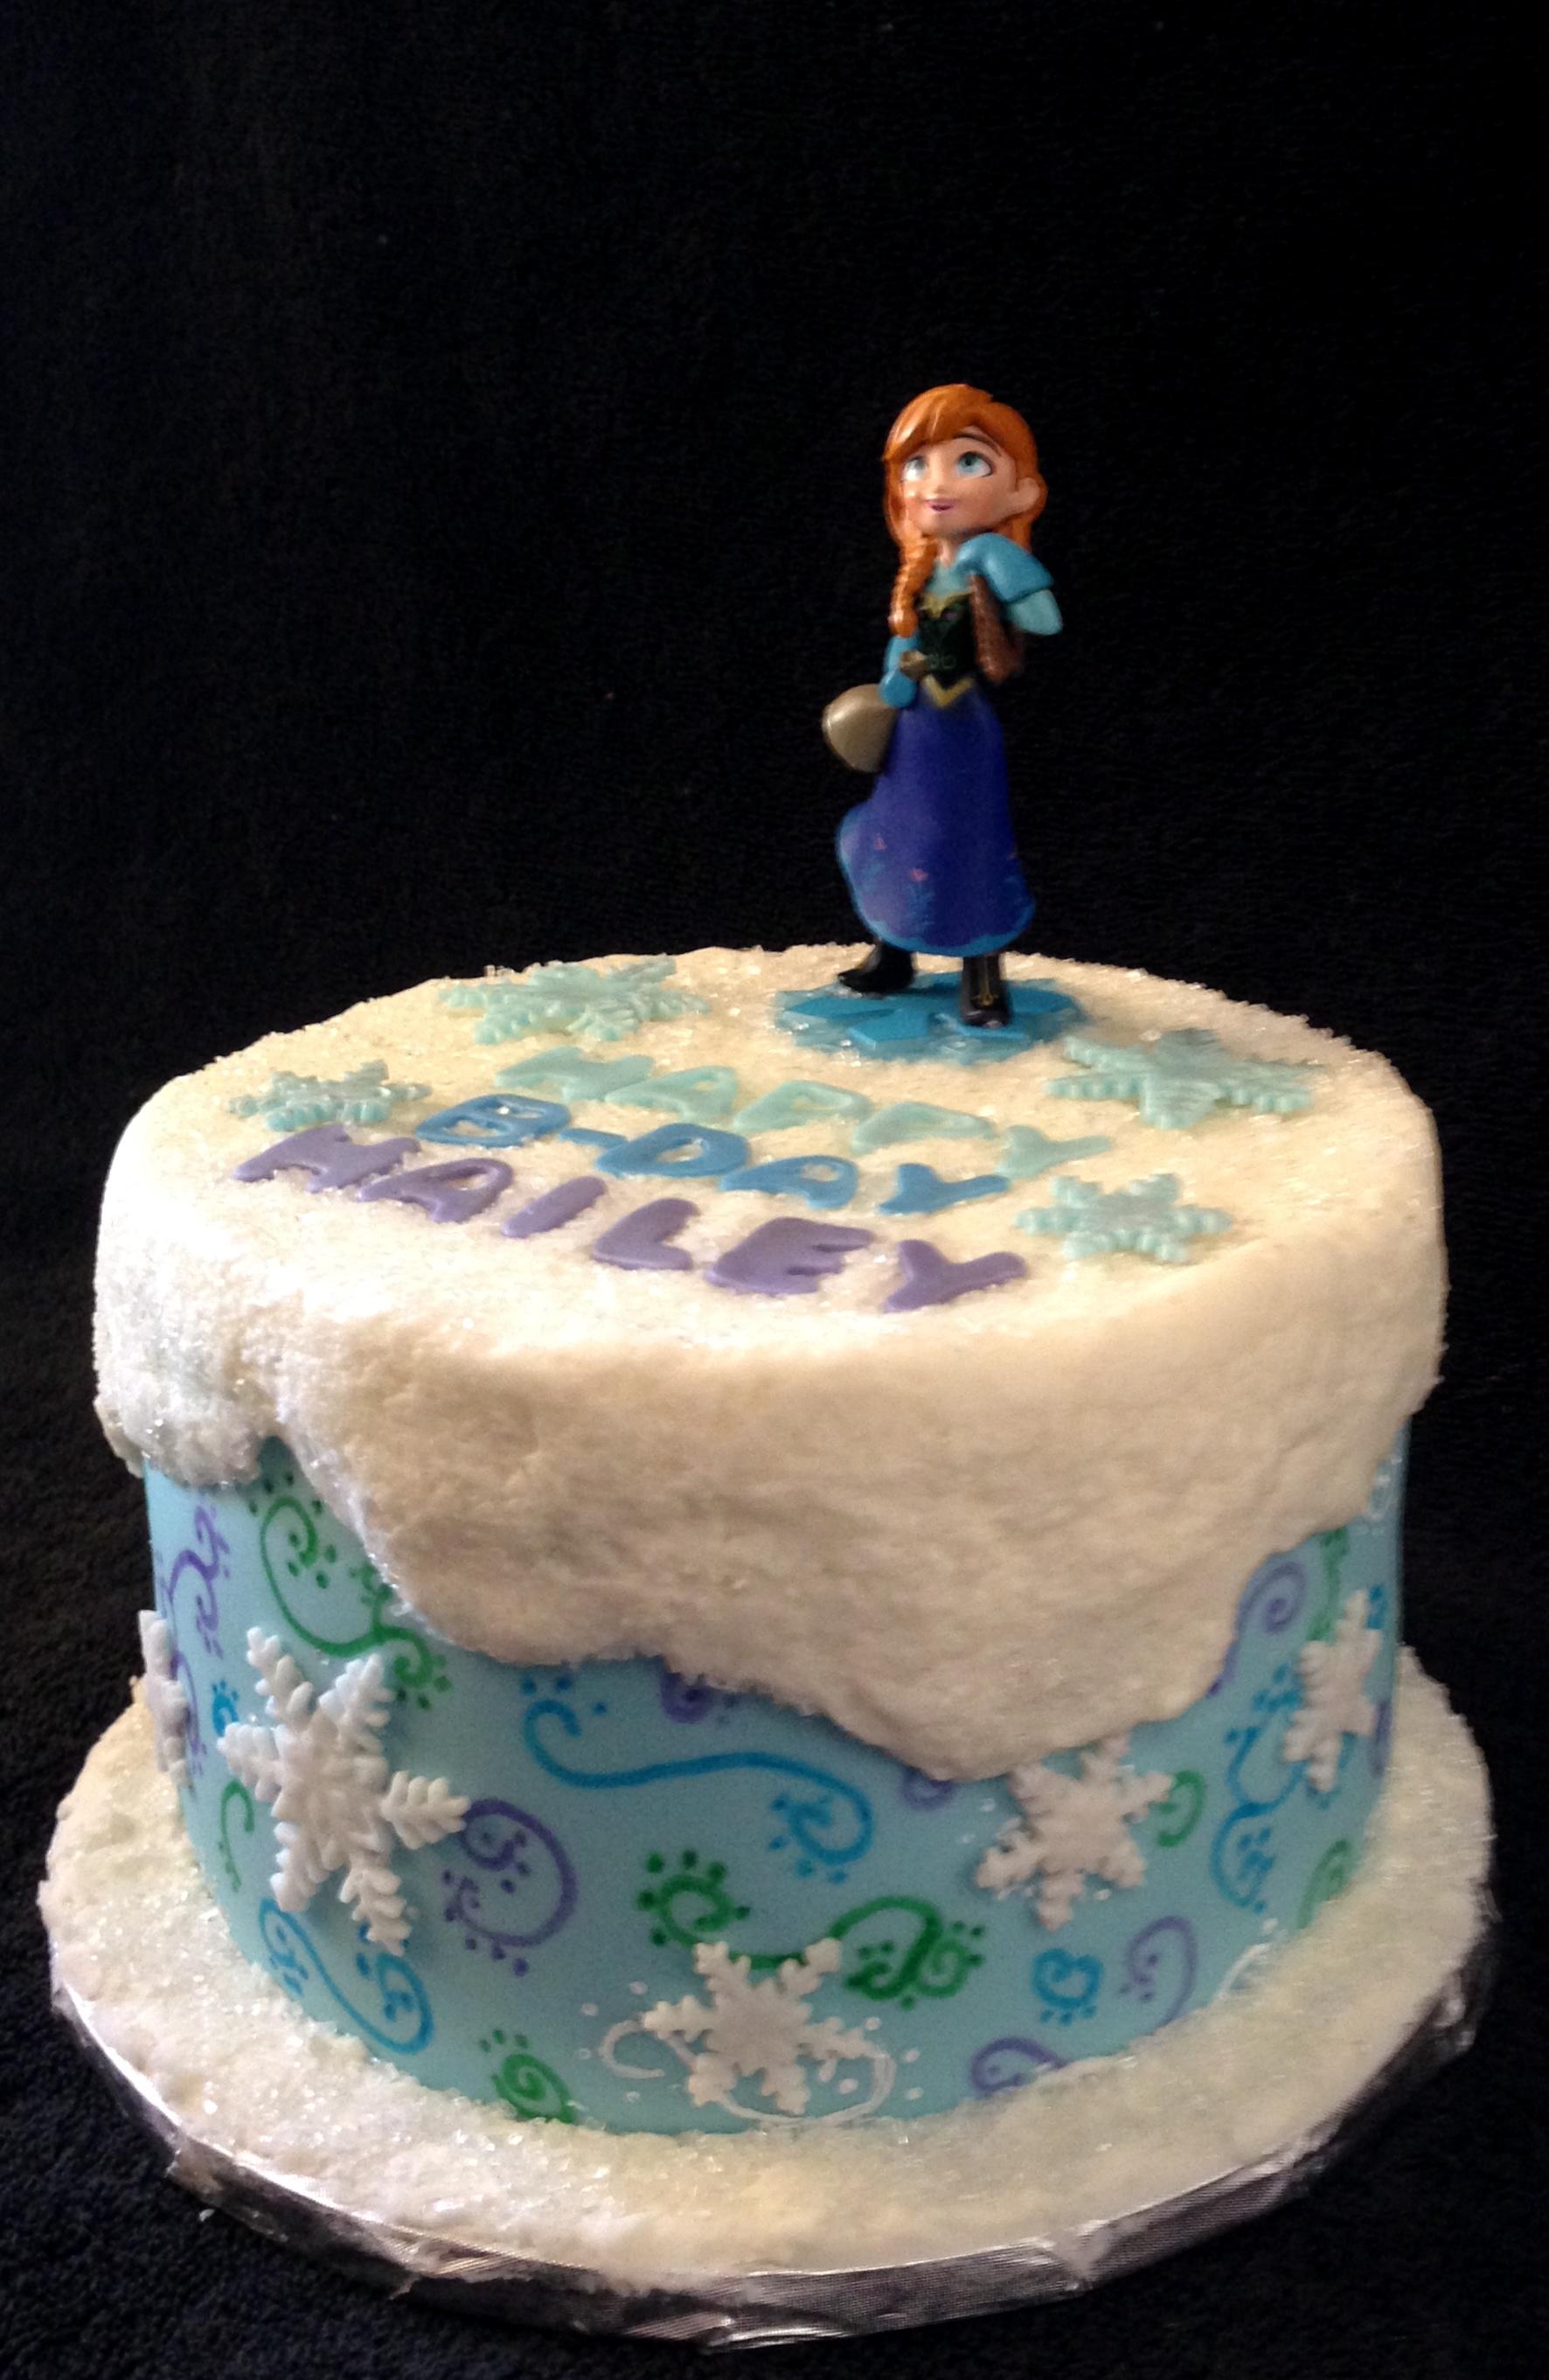 Cake Decorating Frozen Movie : Frozen Movie Theme Cake - CakeCentral.com